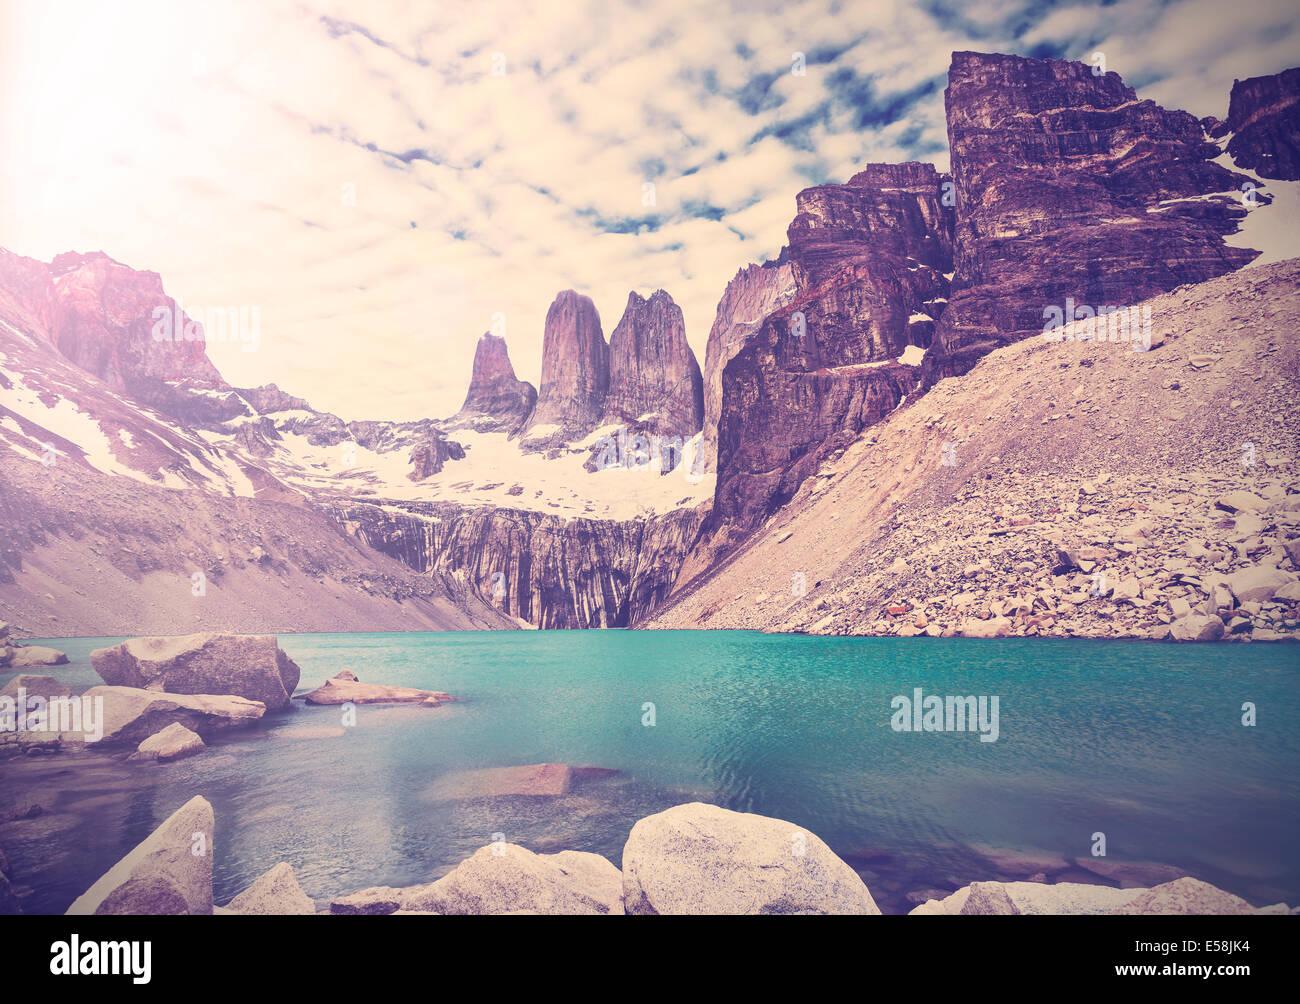 Vintage foto di Parco Nazionale Torres del Paine, Patagonia, Cile Immagini Stock